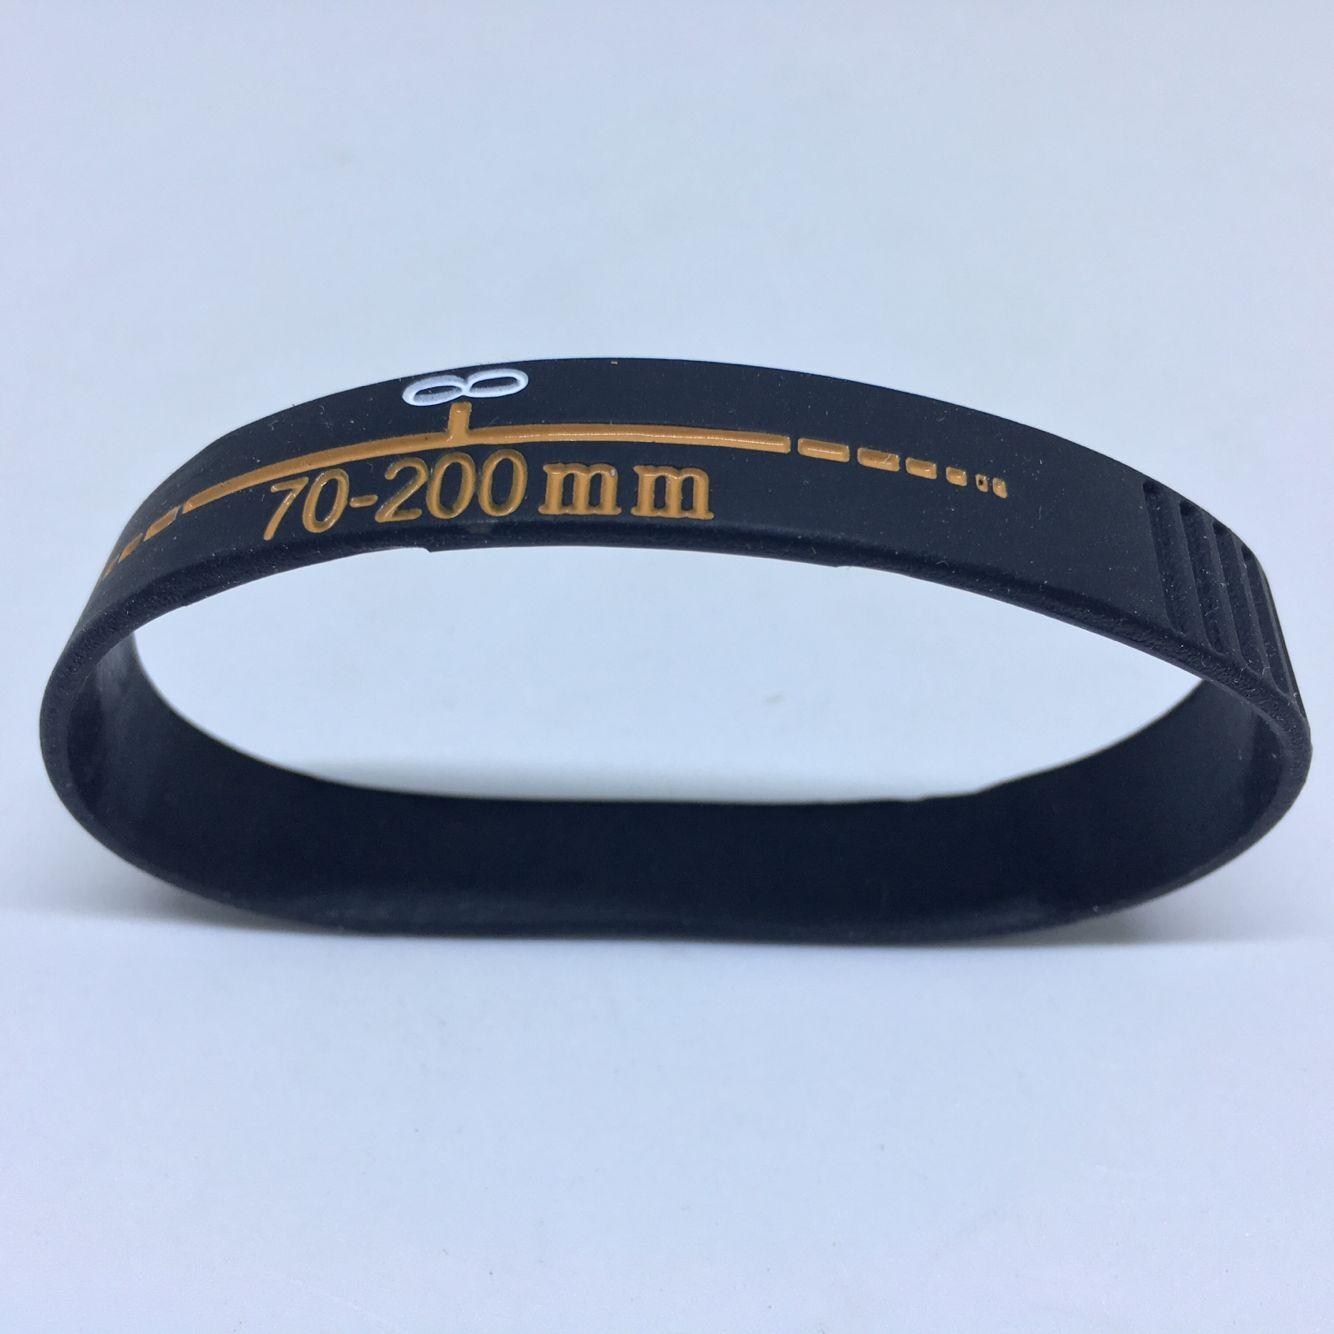 New Lens Bracelets Photographer silicone bracelet Wristbands Lens Zoom Creep for canon nikon DSLR camera free shiping - ANKUX Tech Co., Ltd